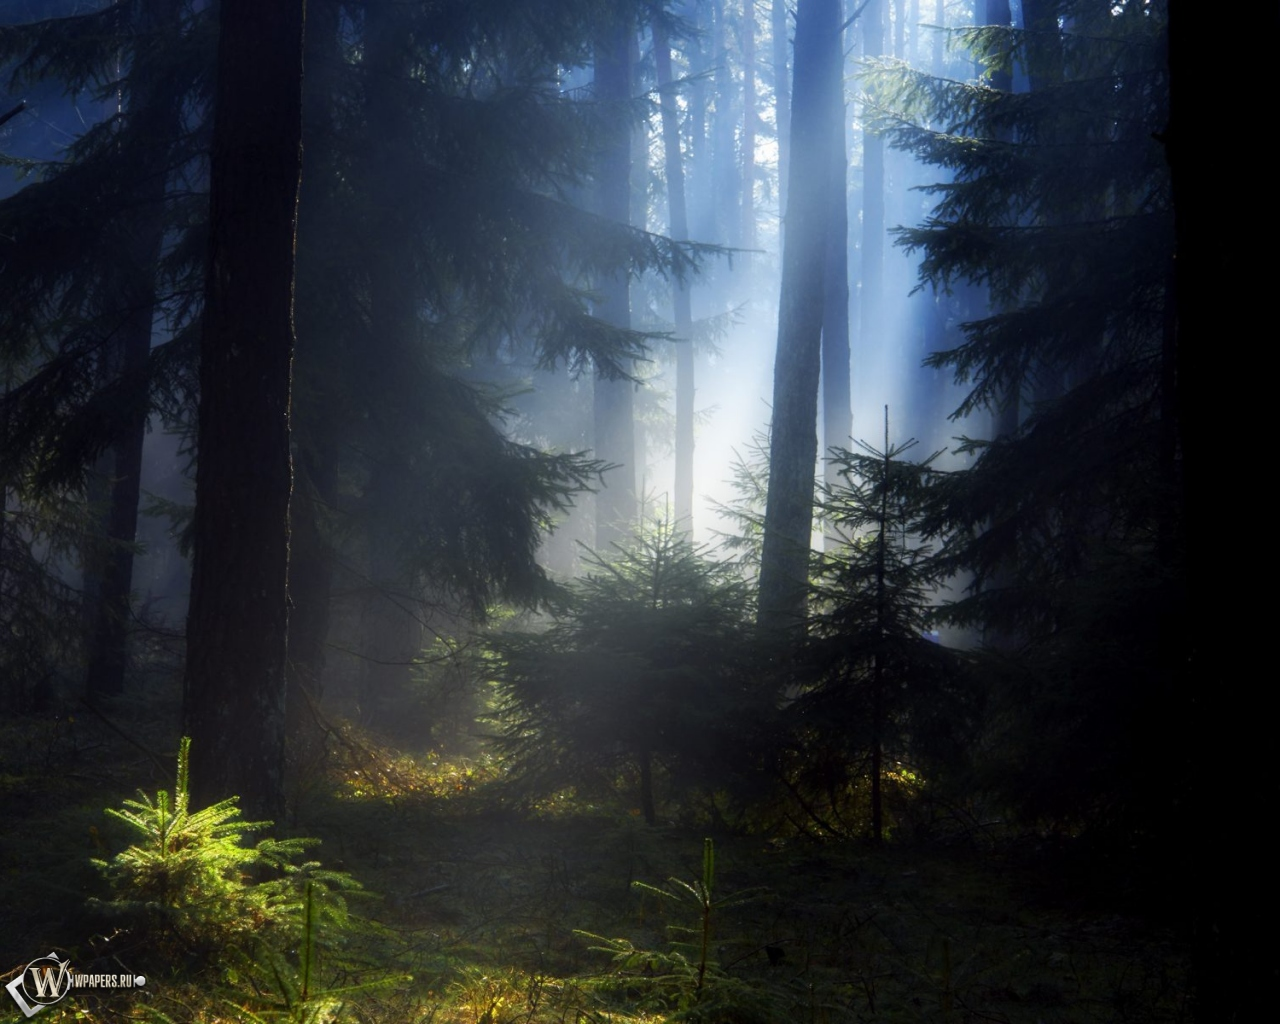 Еловый лес 1280x1024